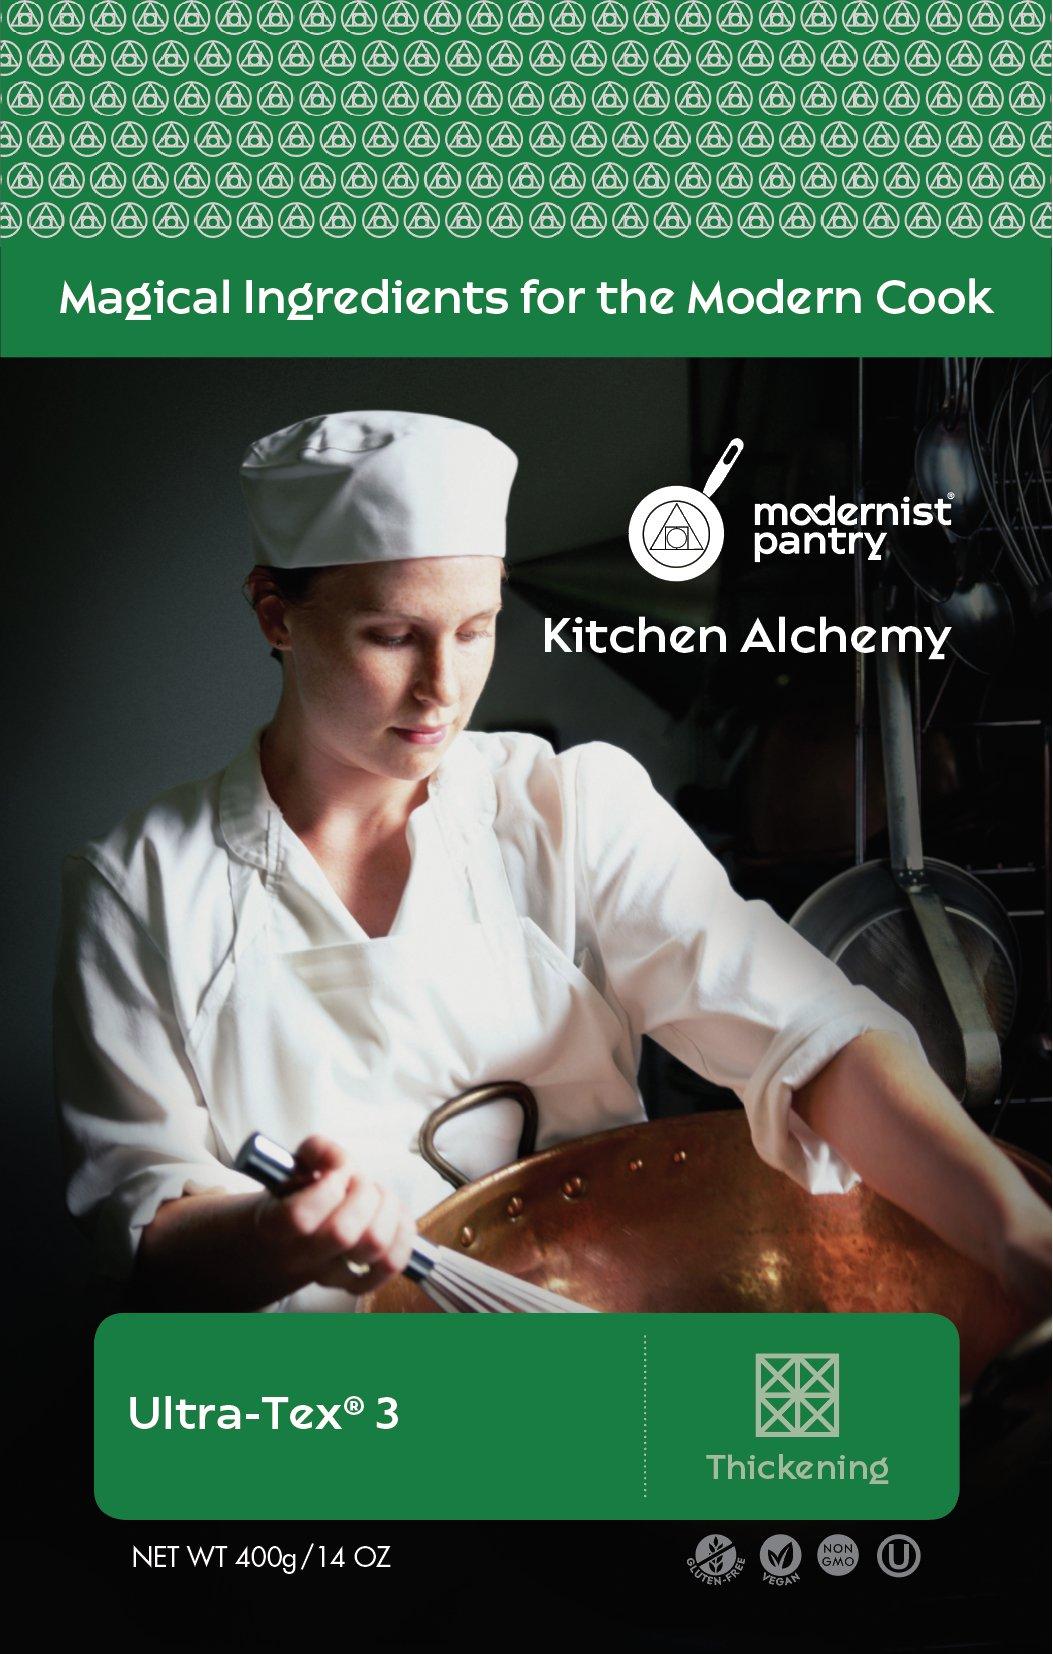 Food Grade Ultra-tex 3 (Molecular Gastronomy) ⊘ Non-GMO ❤ Gluten-Free ☮ Vegan ✡ OU Kosher Certified - 400g/14oz